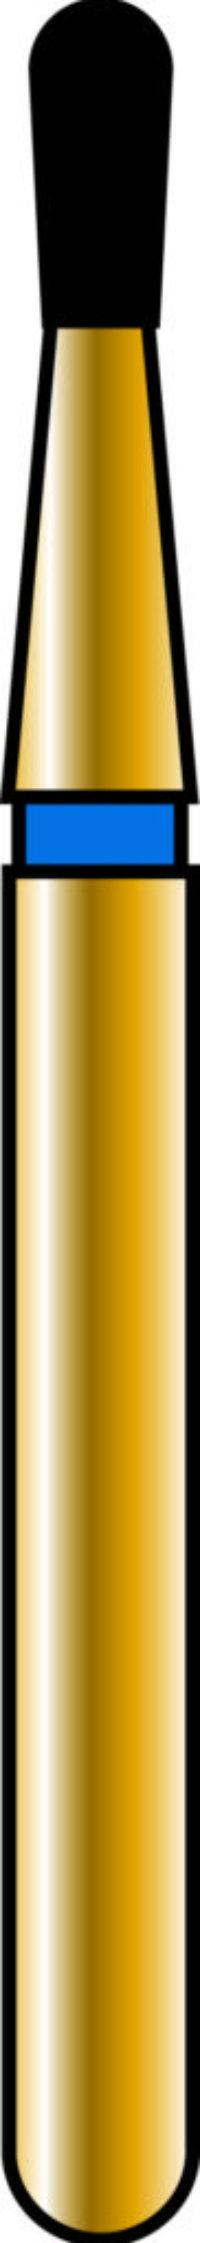 Pear 12-2.7mm Gold Diamond Bur